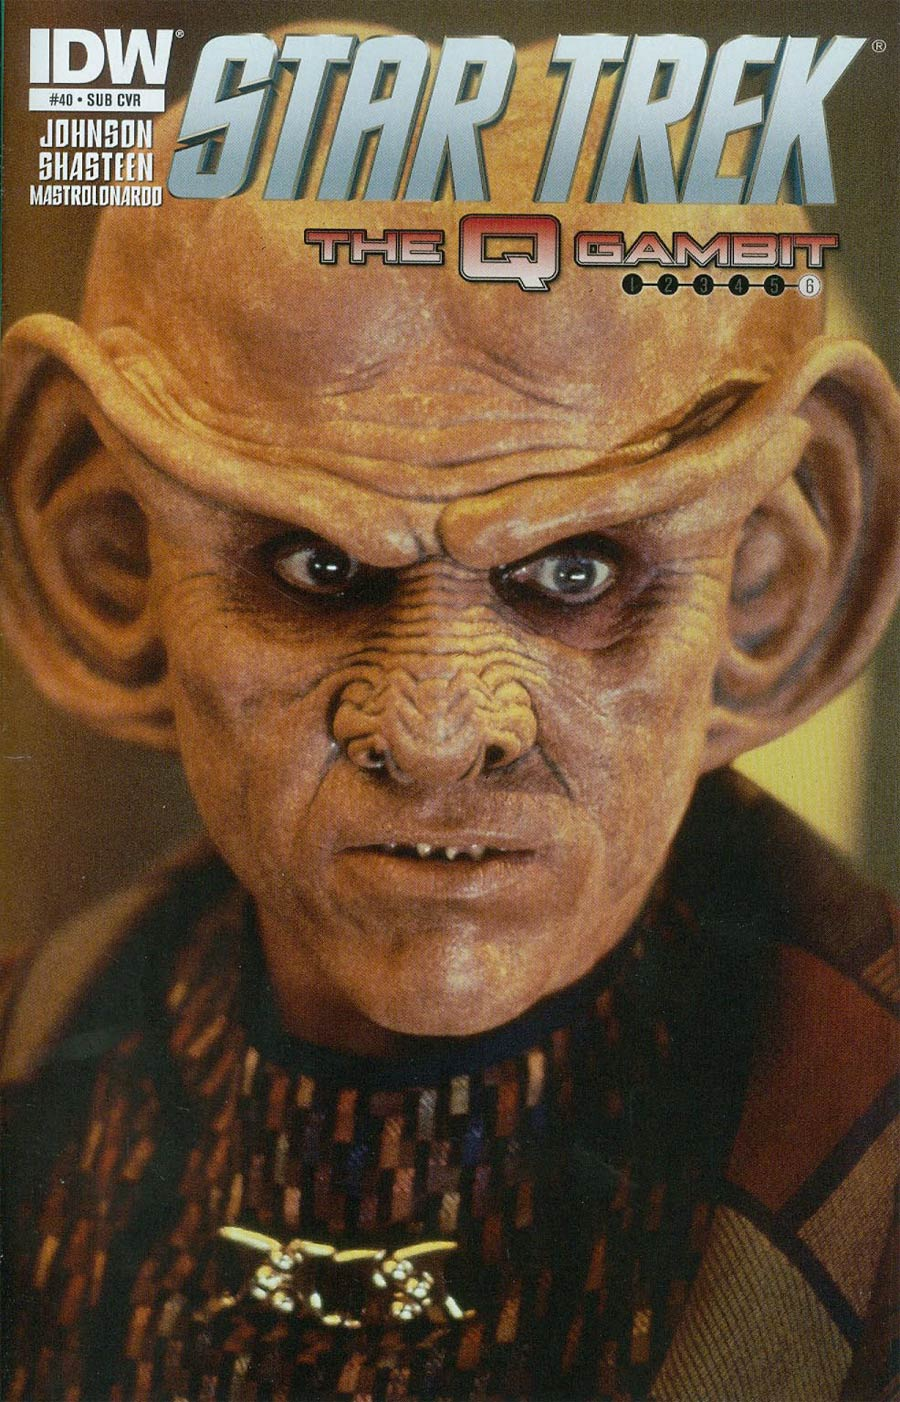 Star Trek (IDW) #40 Cover B Variant Quark Photo Subscription Cover